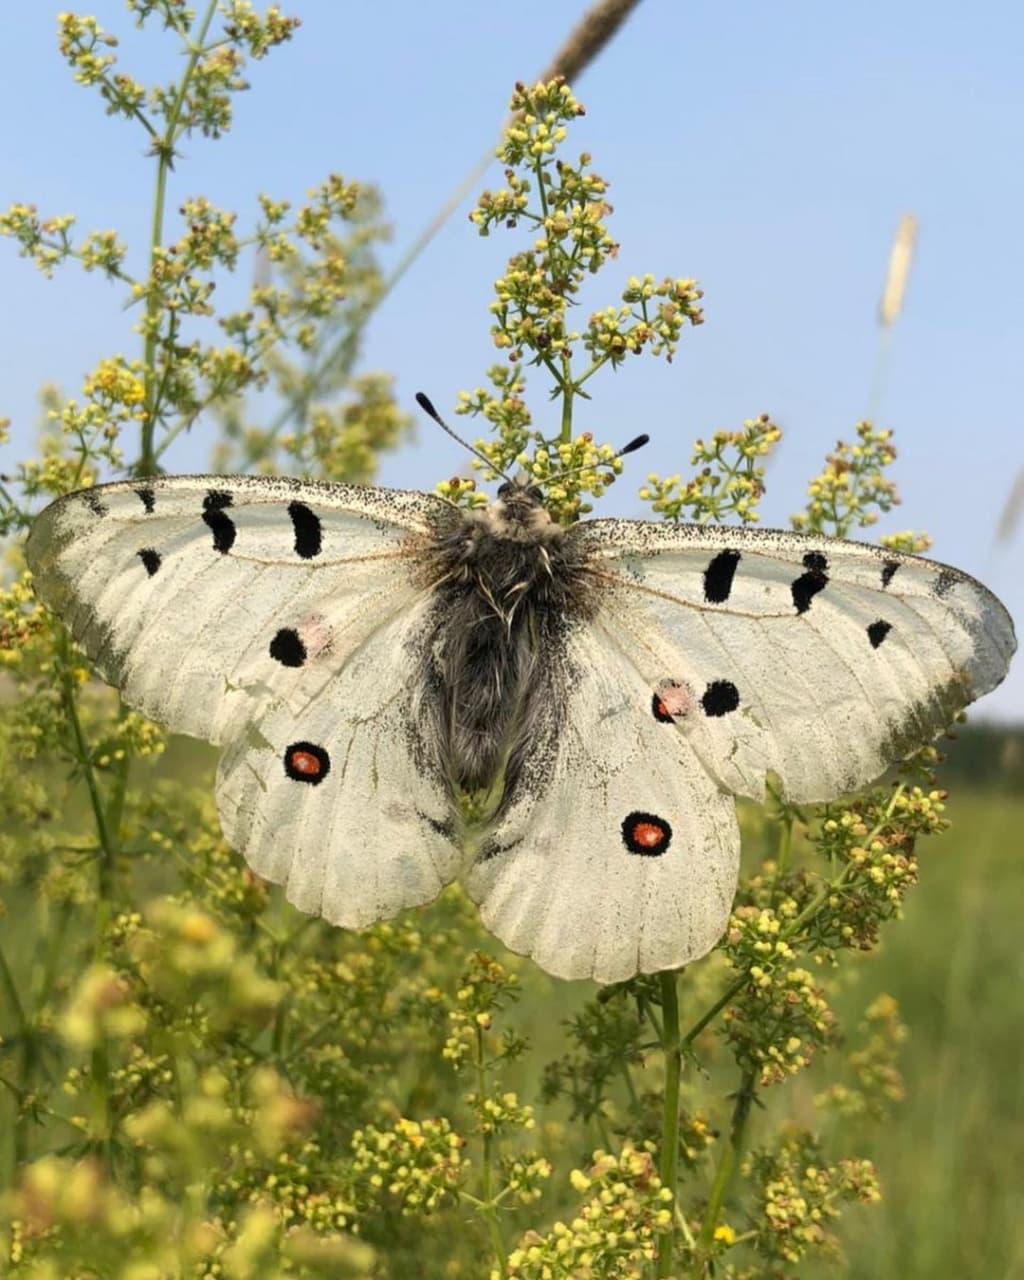 Уникальную бабочку Аполлон заметили в Горном районе Якутии